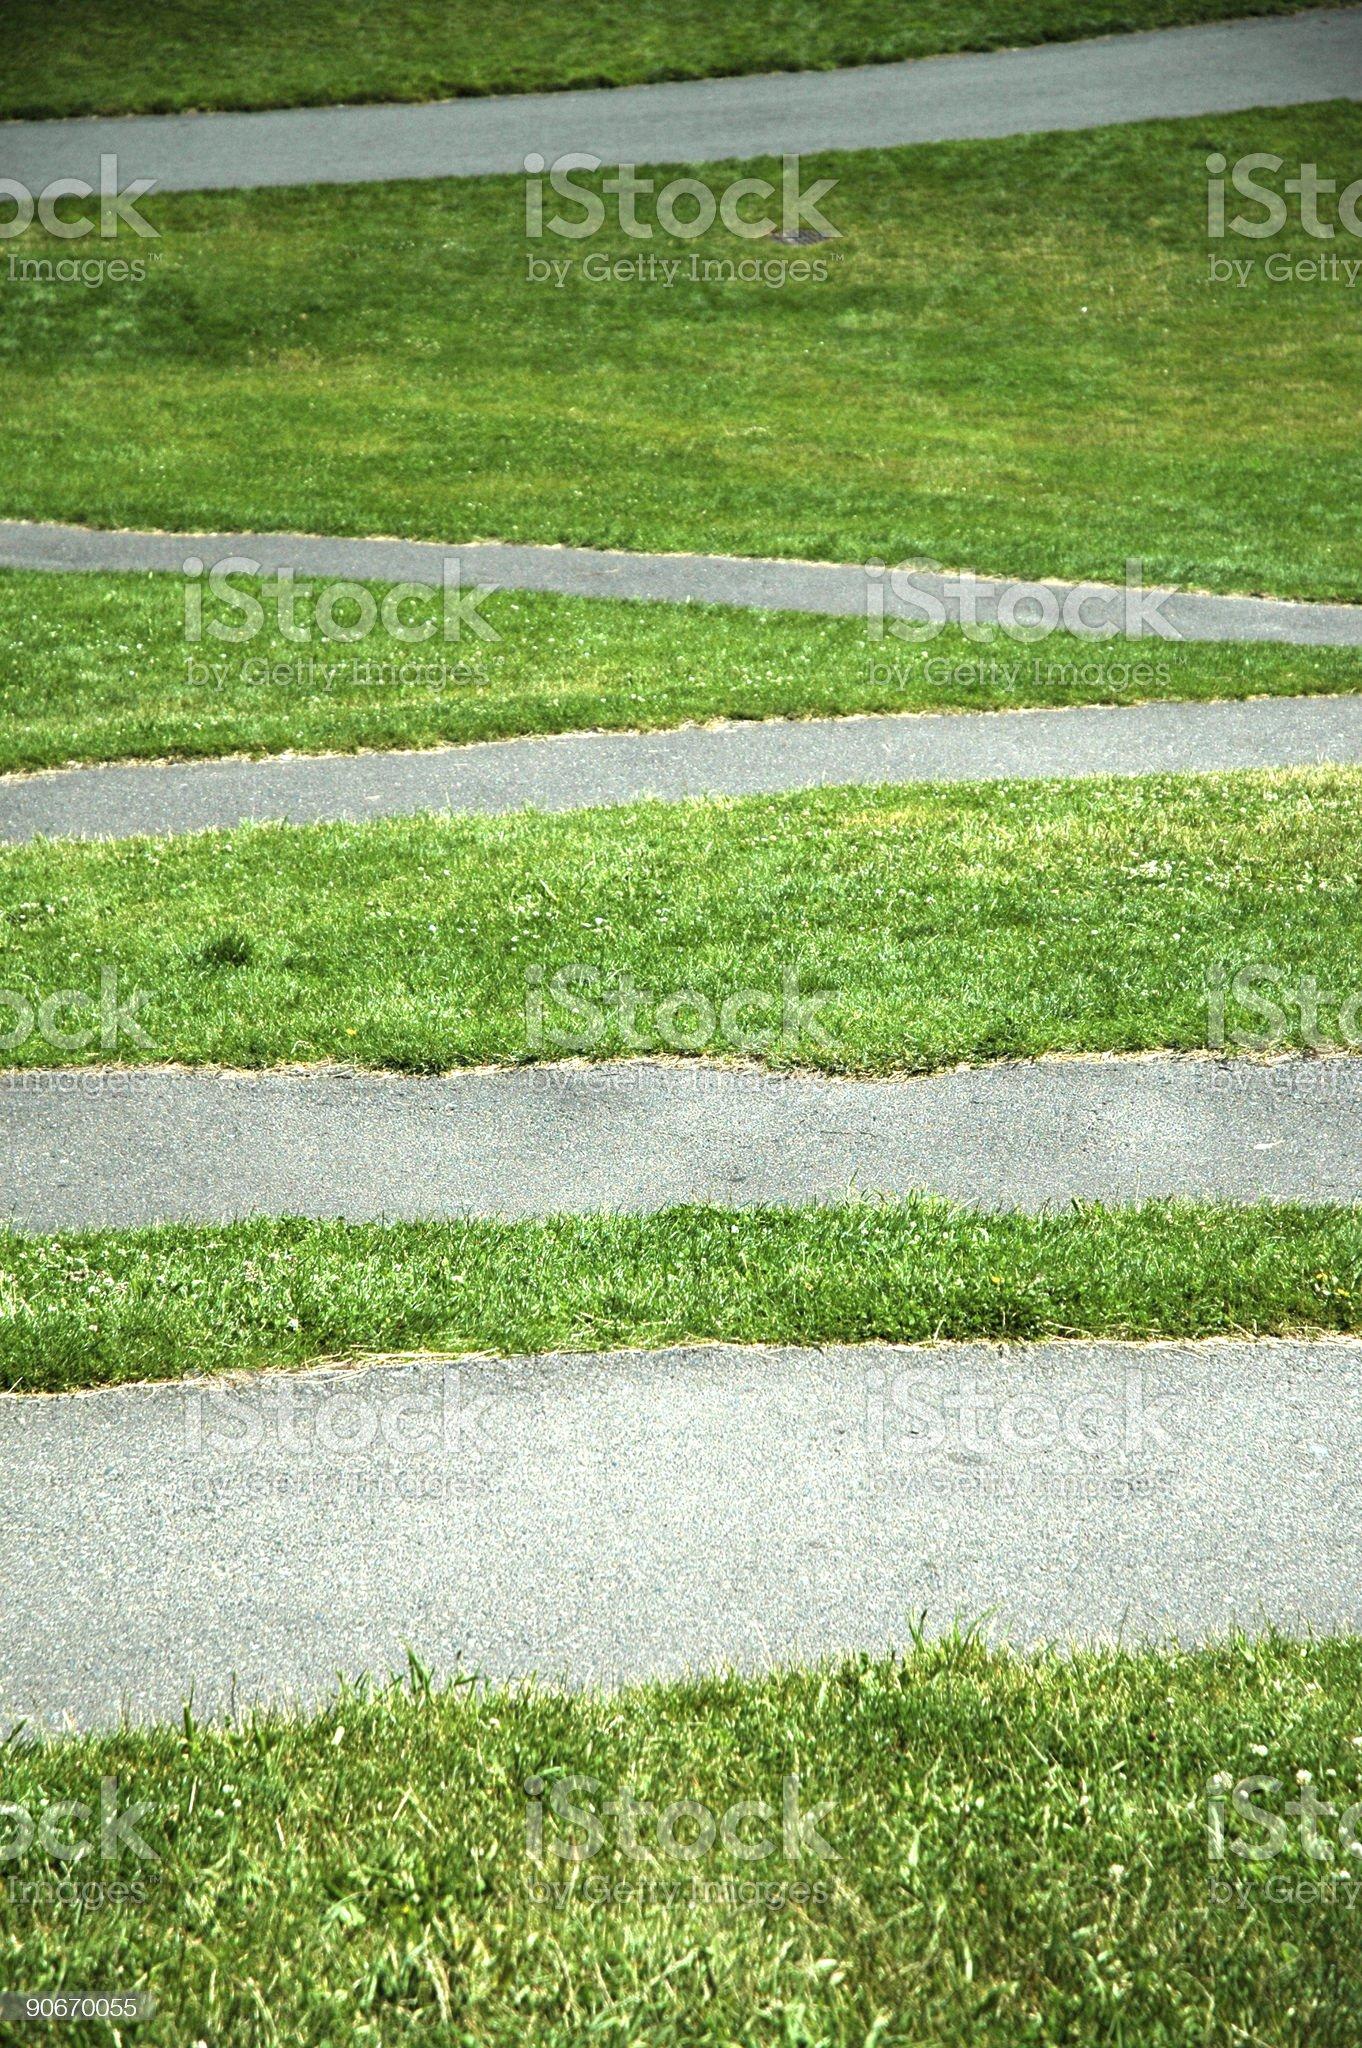 Green Grass Pattern 2 royalty-free stock photo